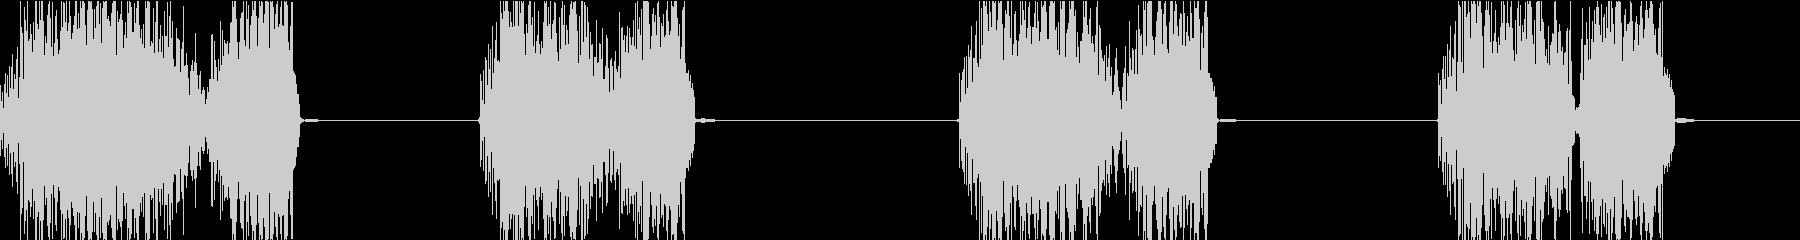 DJプレイ スクラッチ・ノイズ 133の未再生の波形